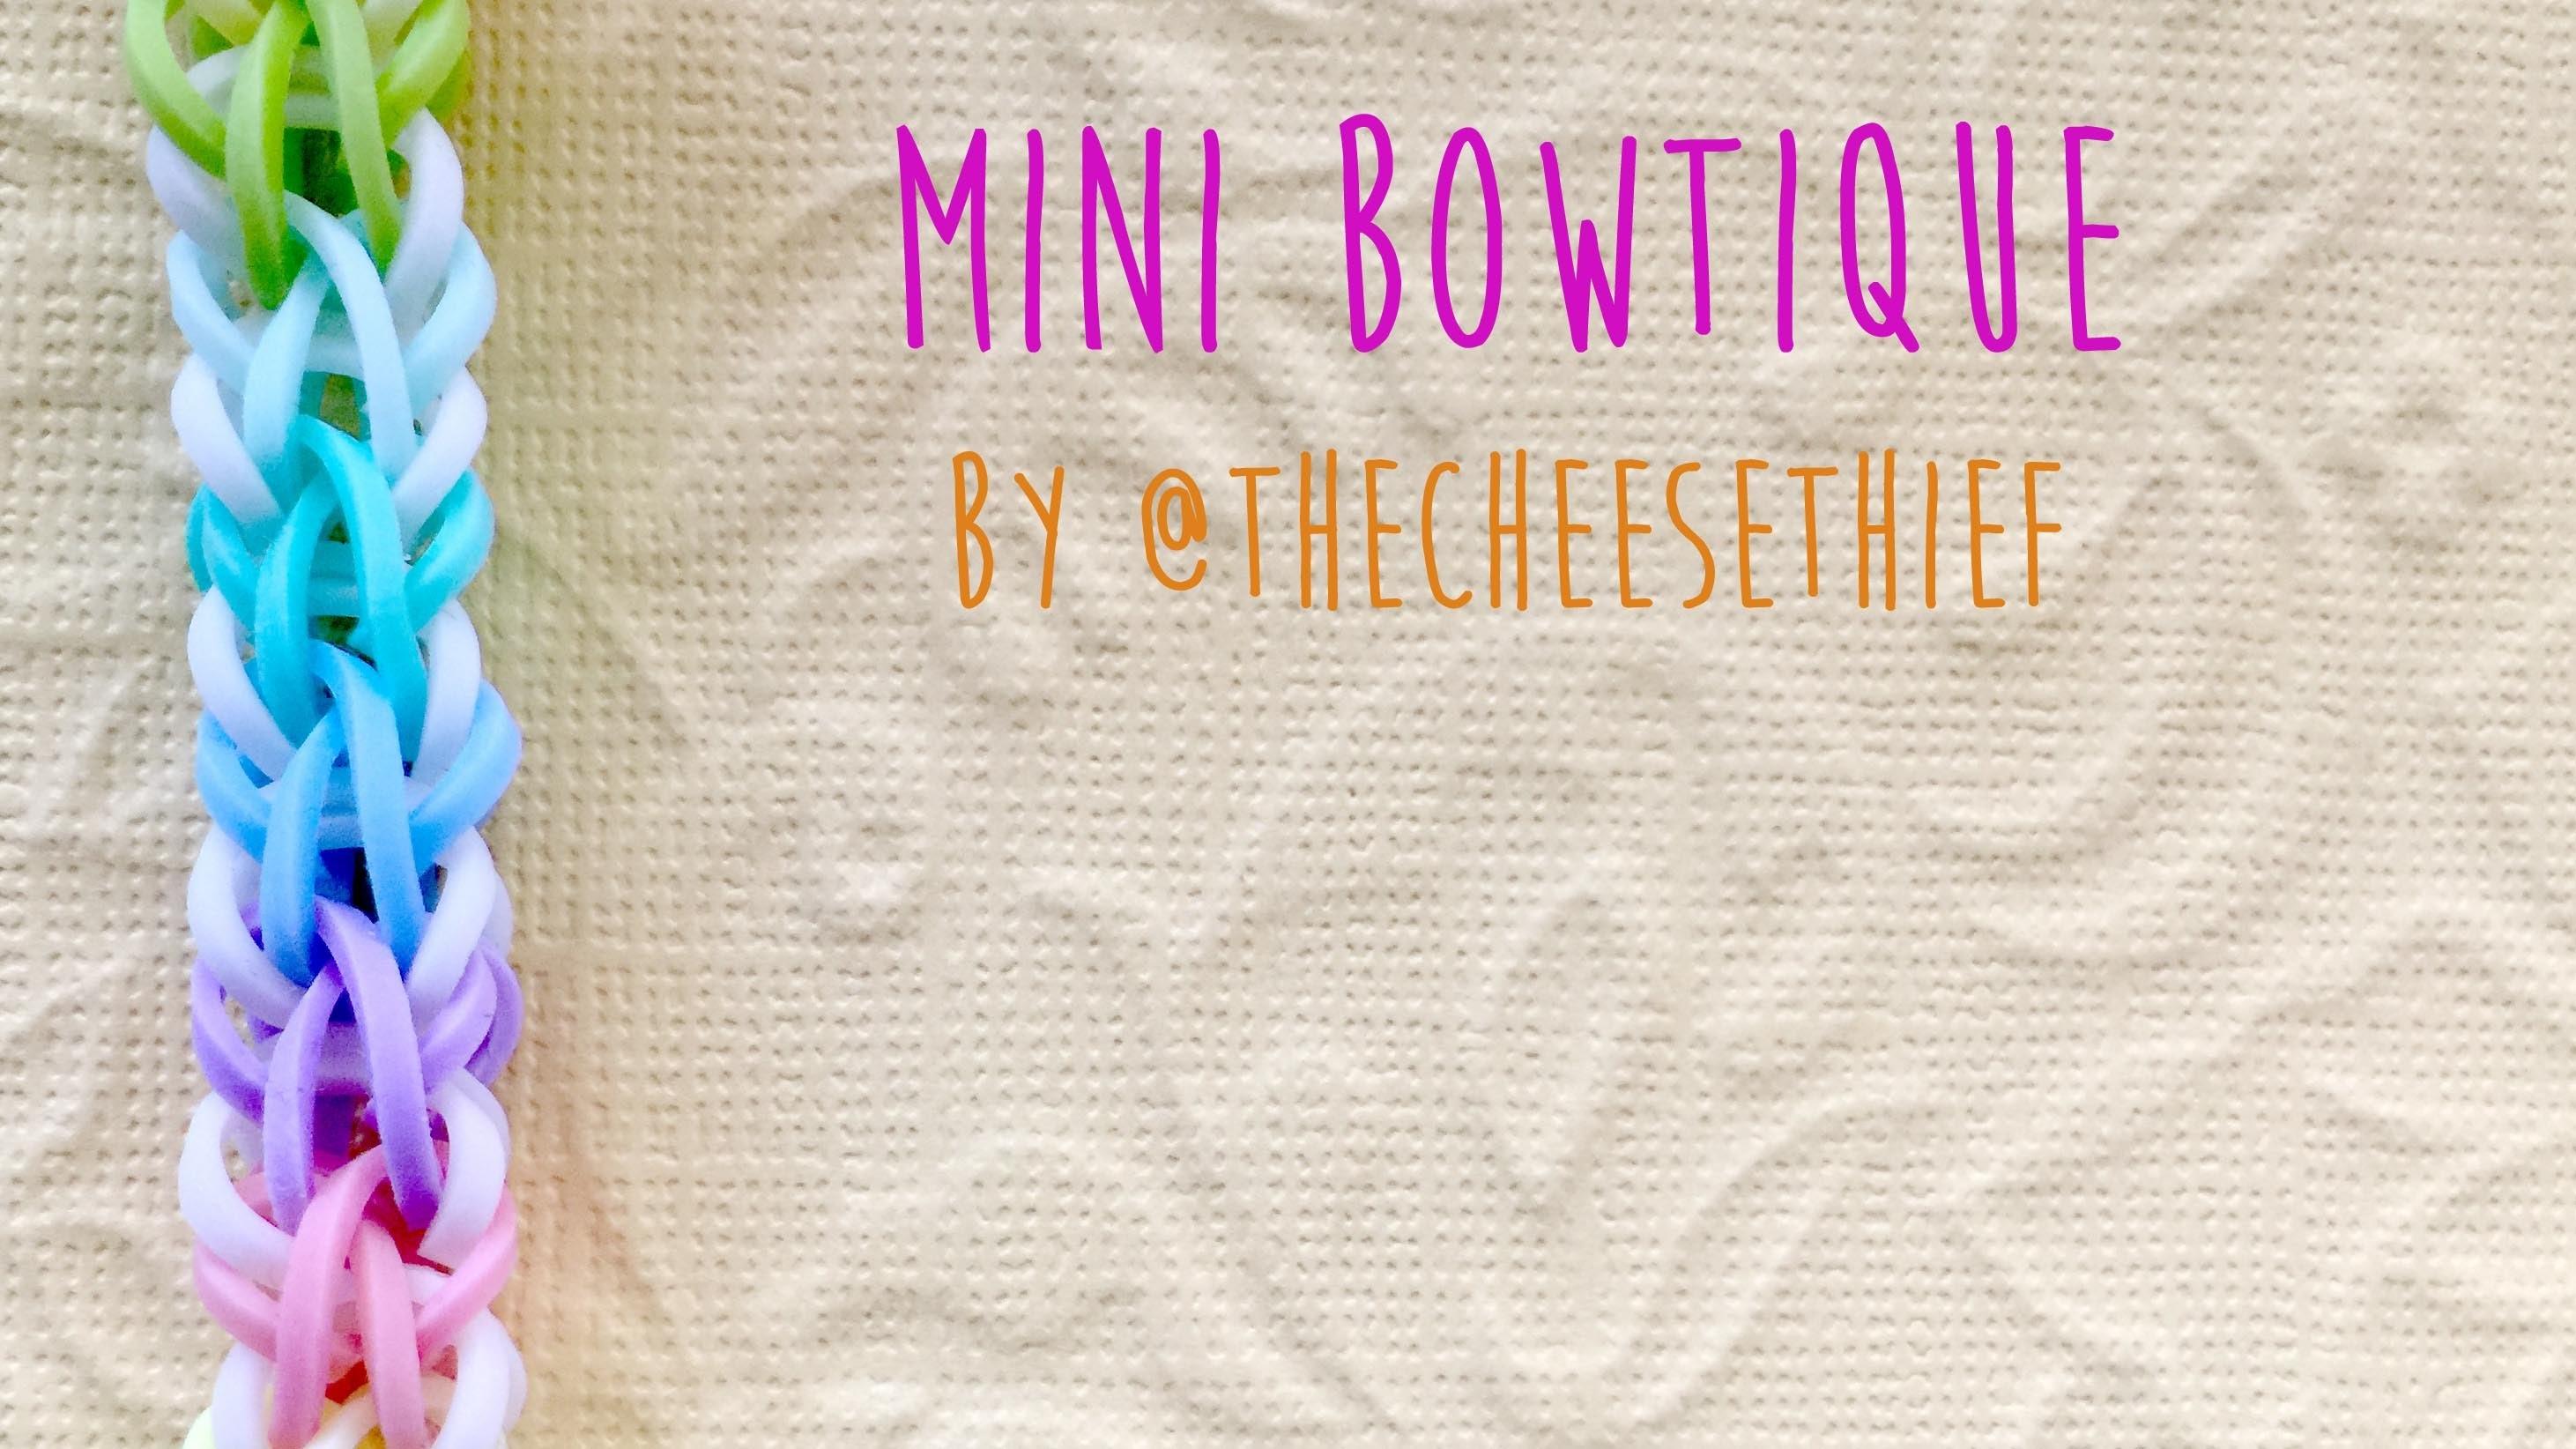 Rainbow Loom Bands Mini Bowtique Bracelet Tutorial